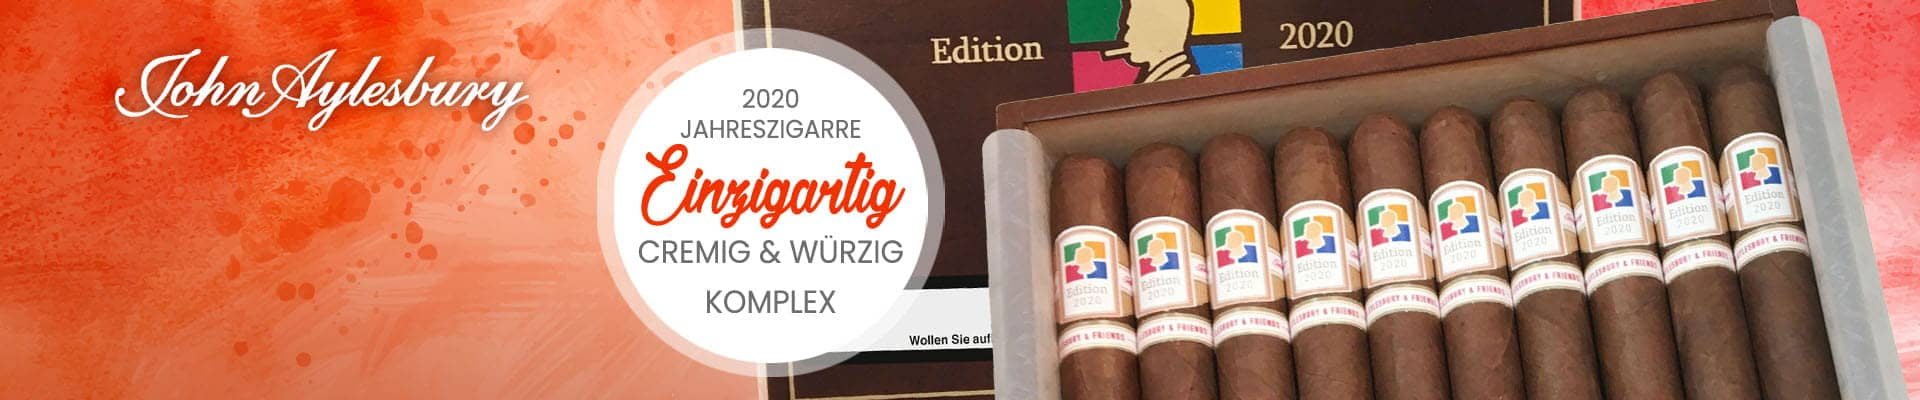 Jahreszigarre 2020 Limited Edition